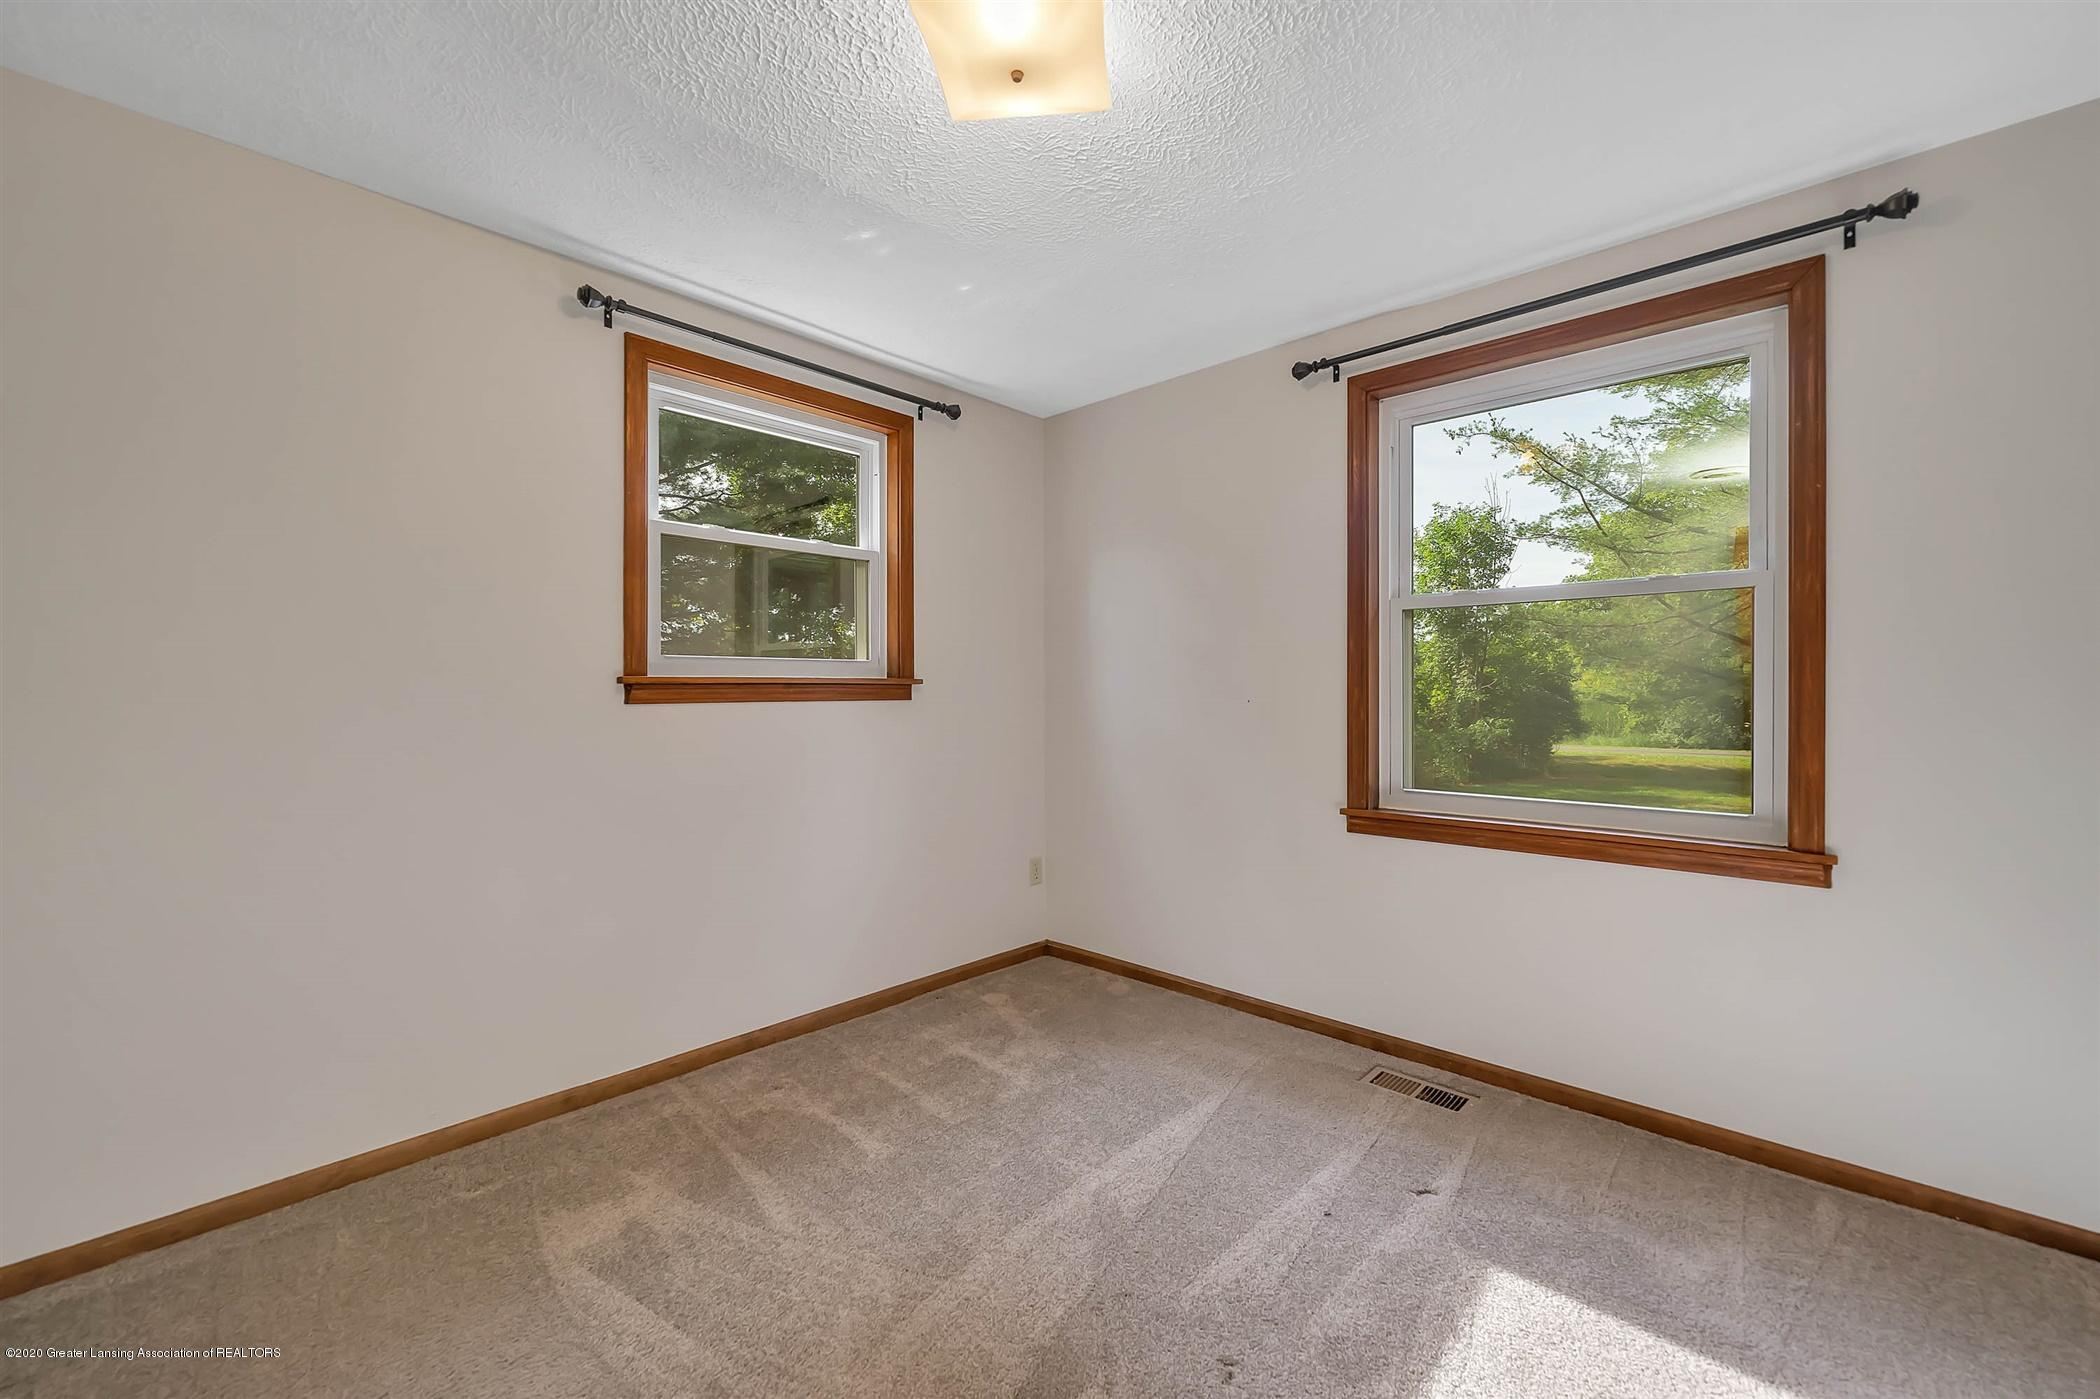 6750 W Lovejoy Rd - (16) 6750 Lovejoy Bedroom 2 - 16